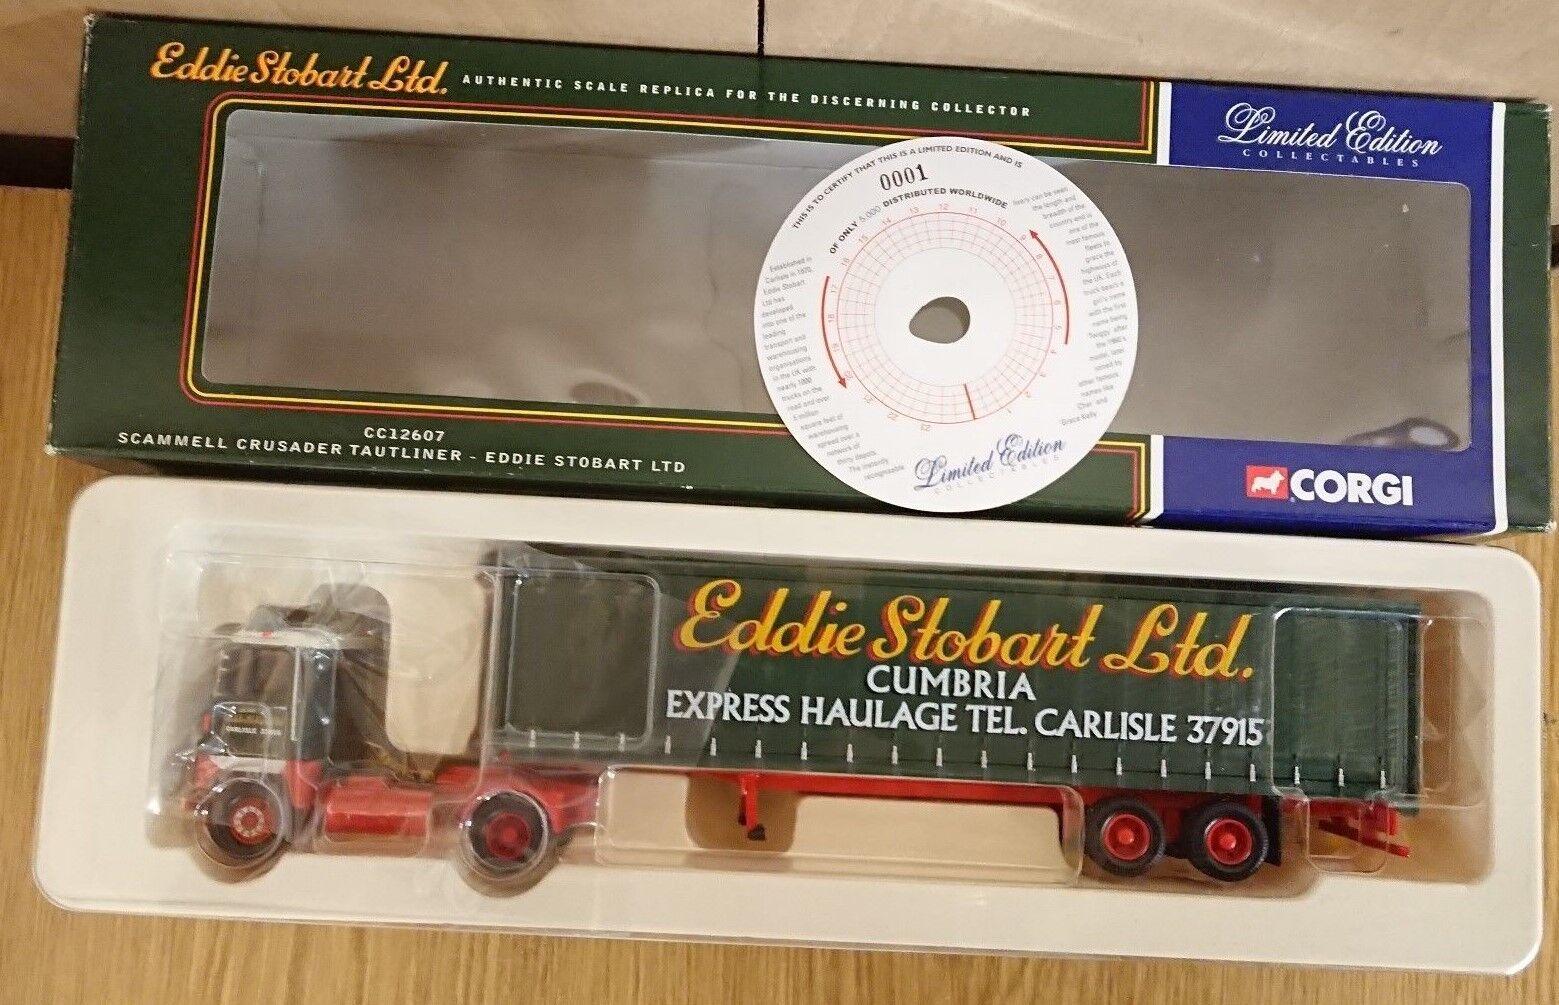 CORGI CC12607 SCAMMELL crusader & remorque Eddie Stobart ltd edition 0001 de 5000